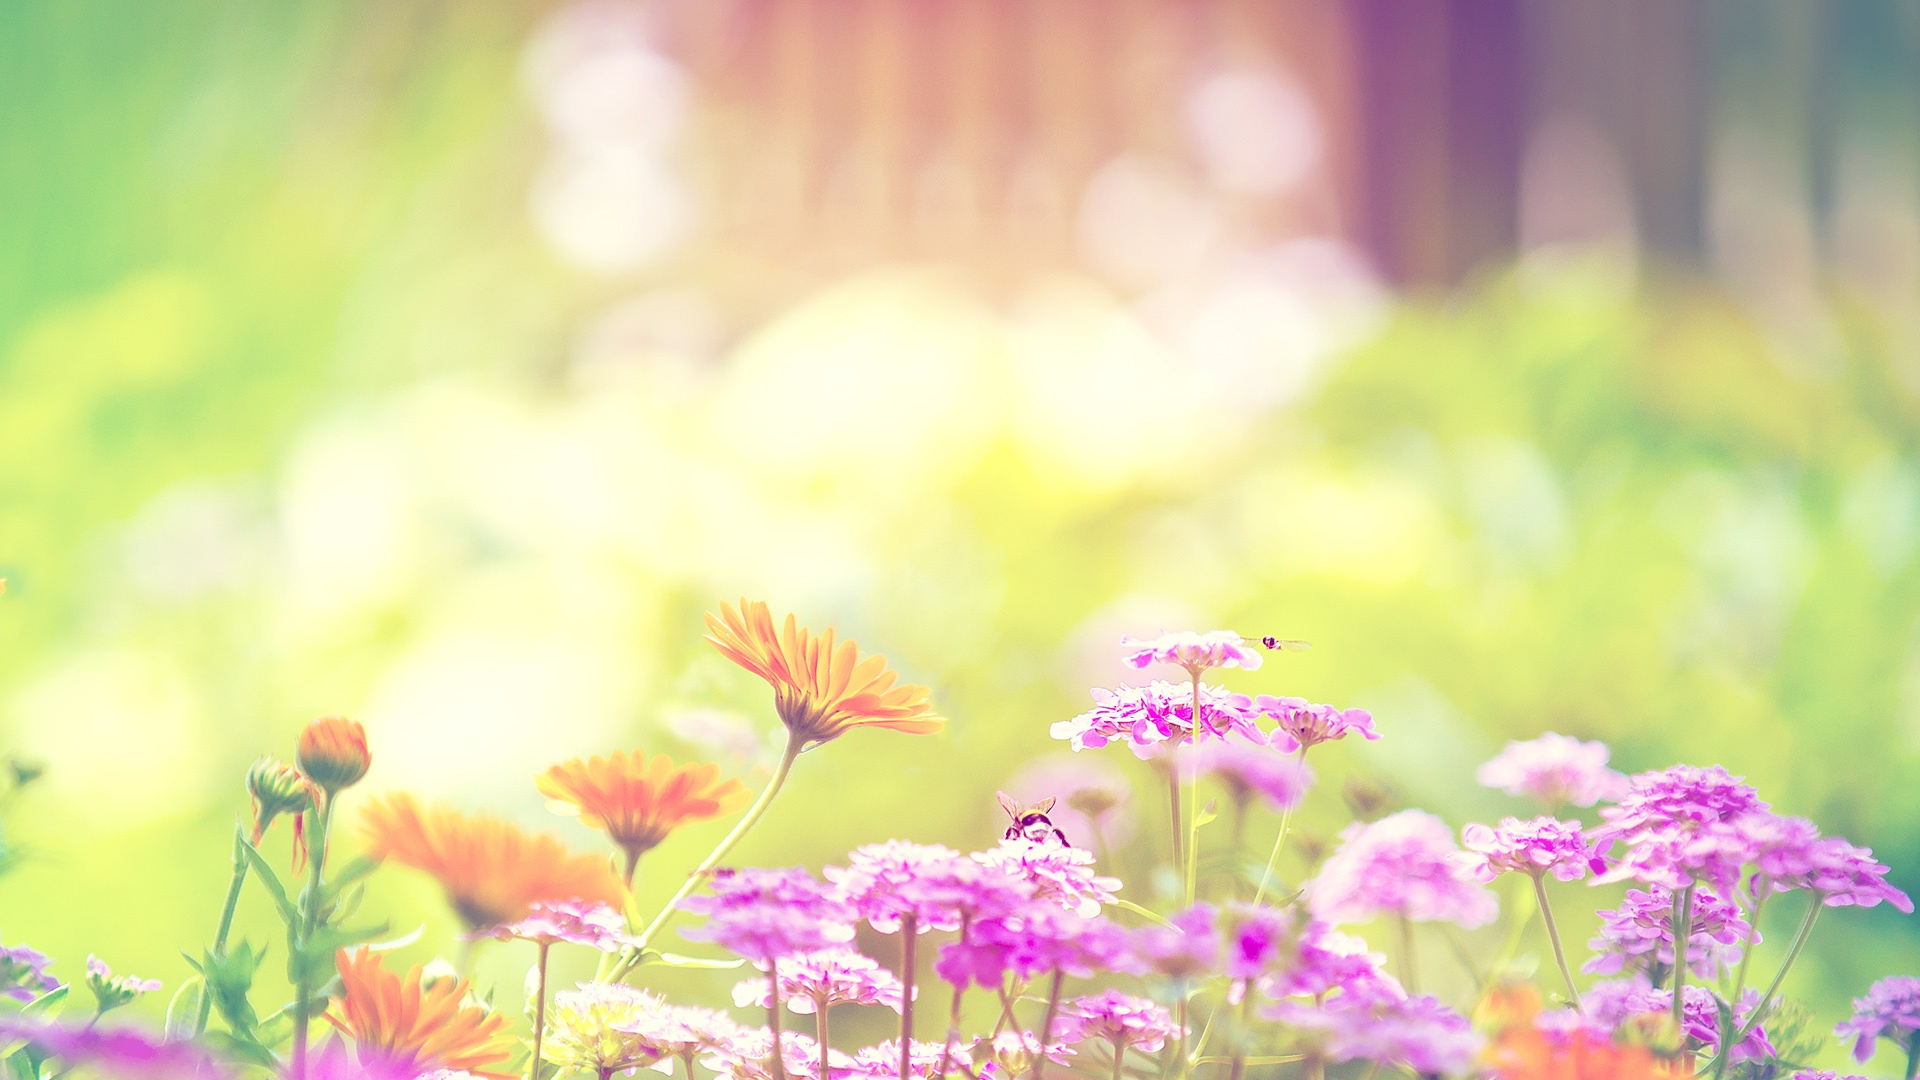 Vintage Flower Wallpapers Iphone Tumblr Pink Purple 1920x1080